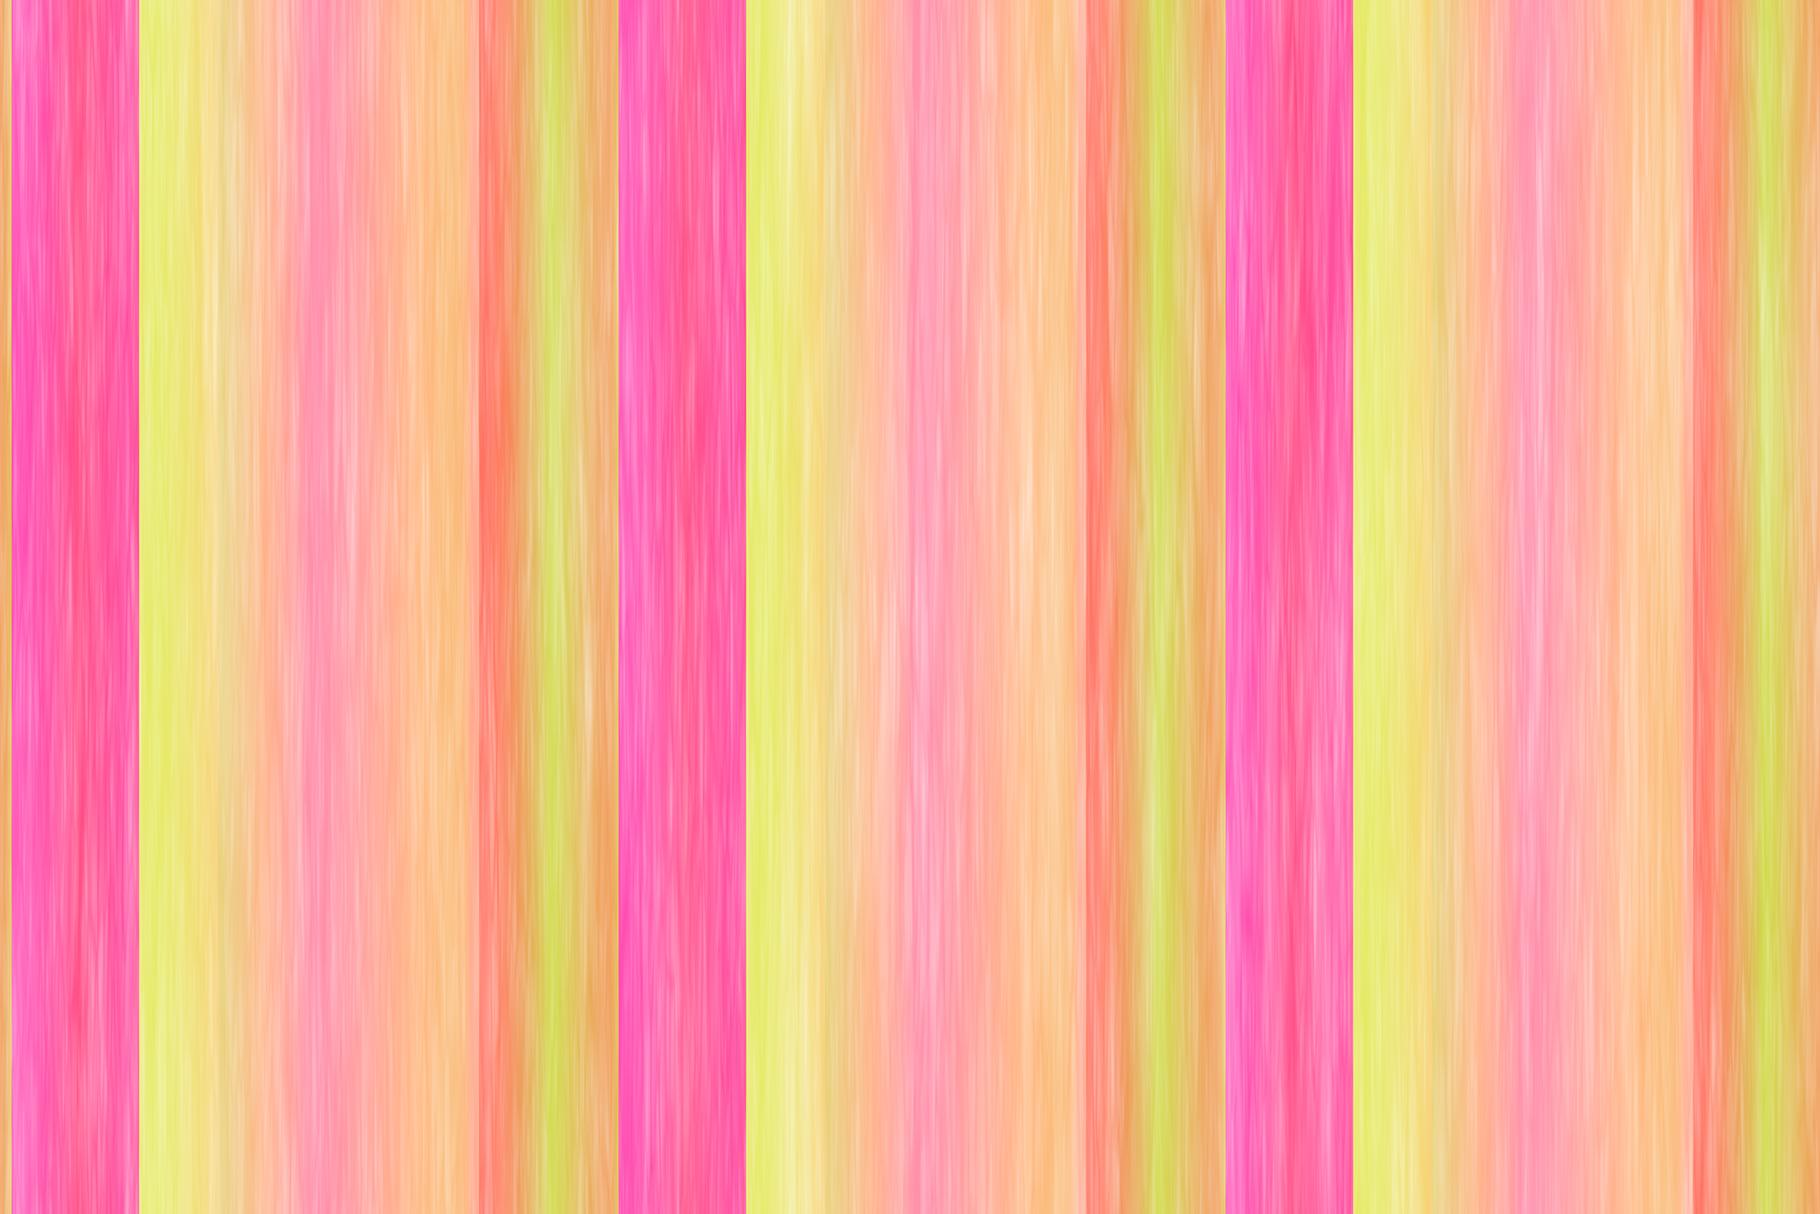 10 Scrapbook Sherbert Textures TexturesWorld 1820x1214